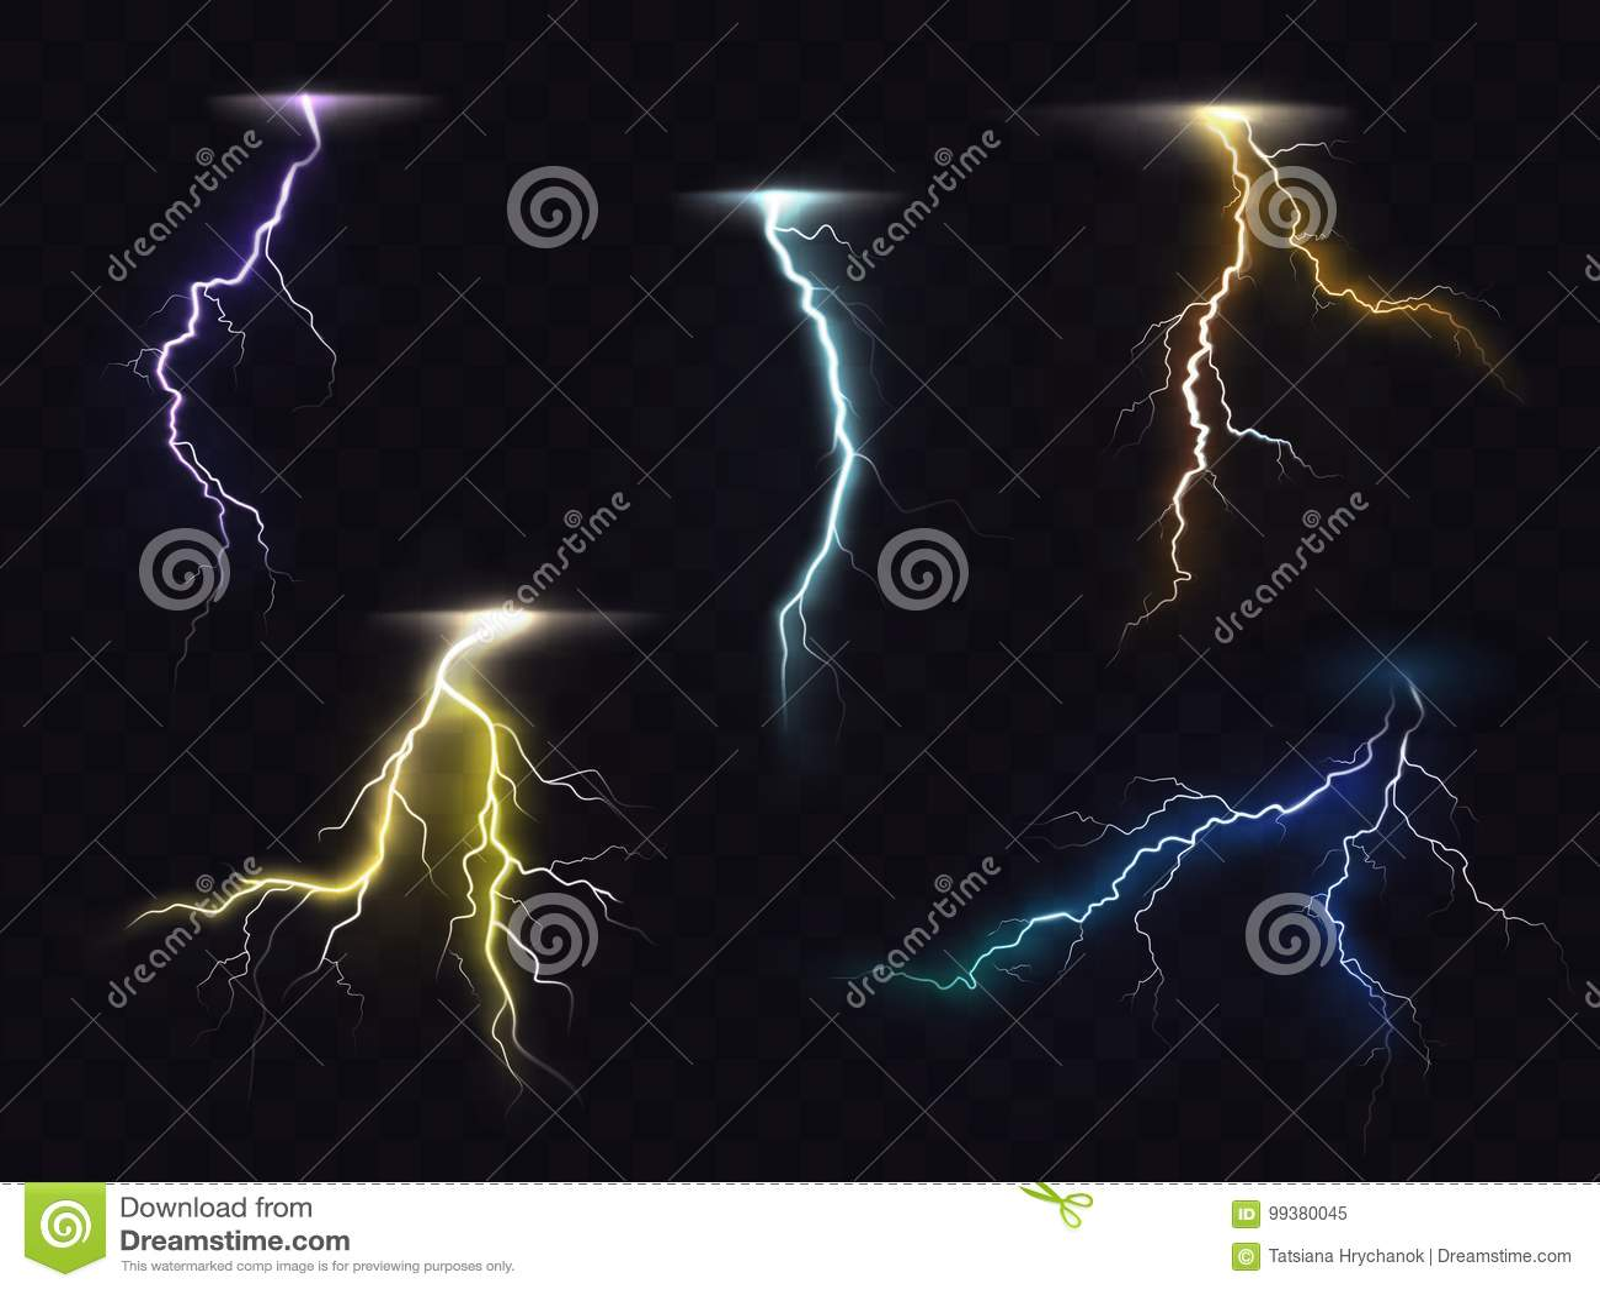 Lightning Flash Glowing Light Effects Vector Set Stock